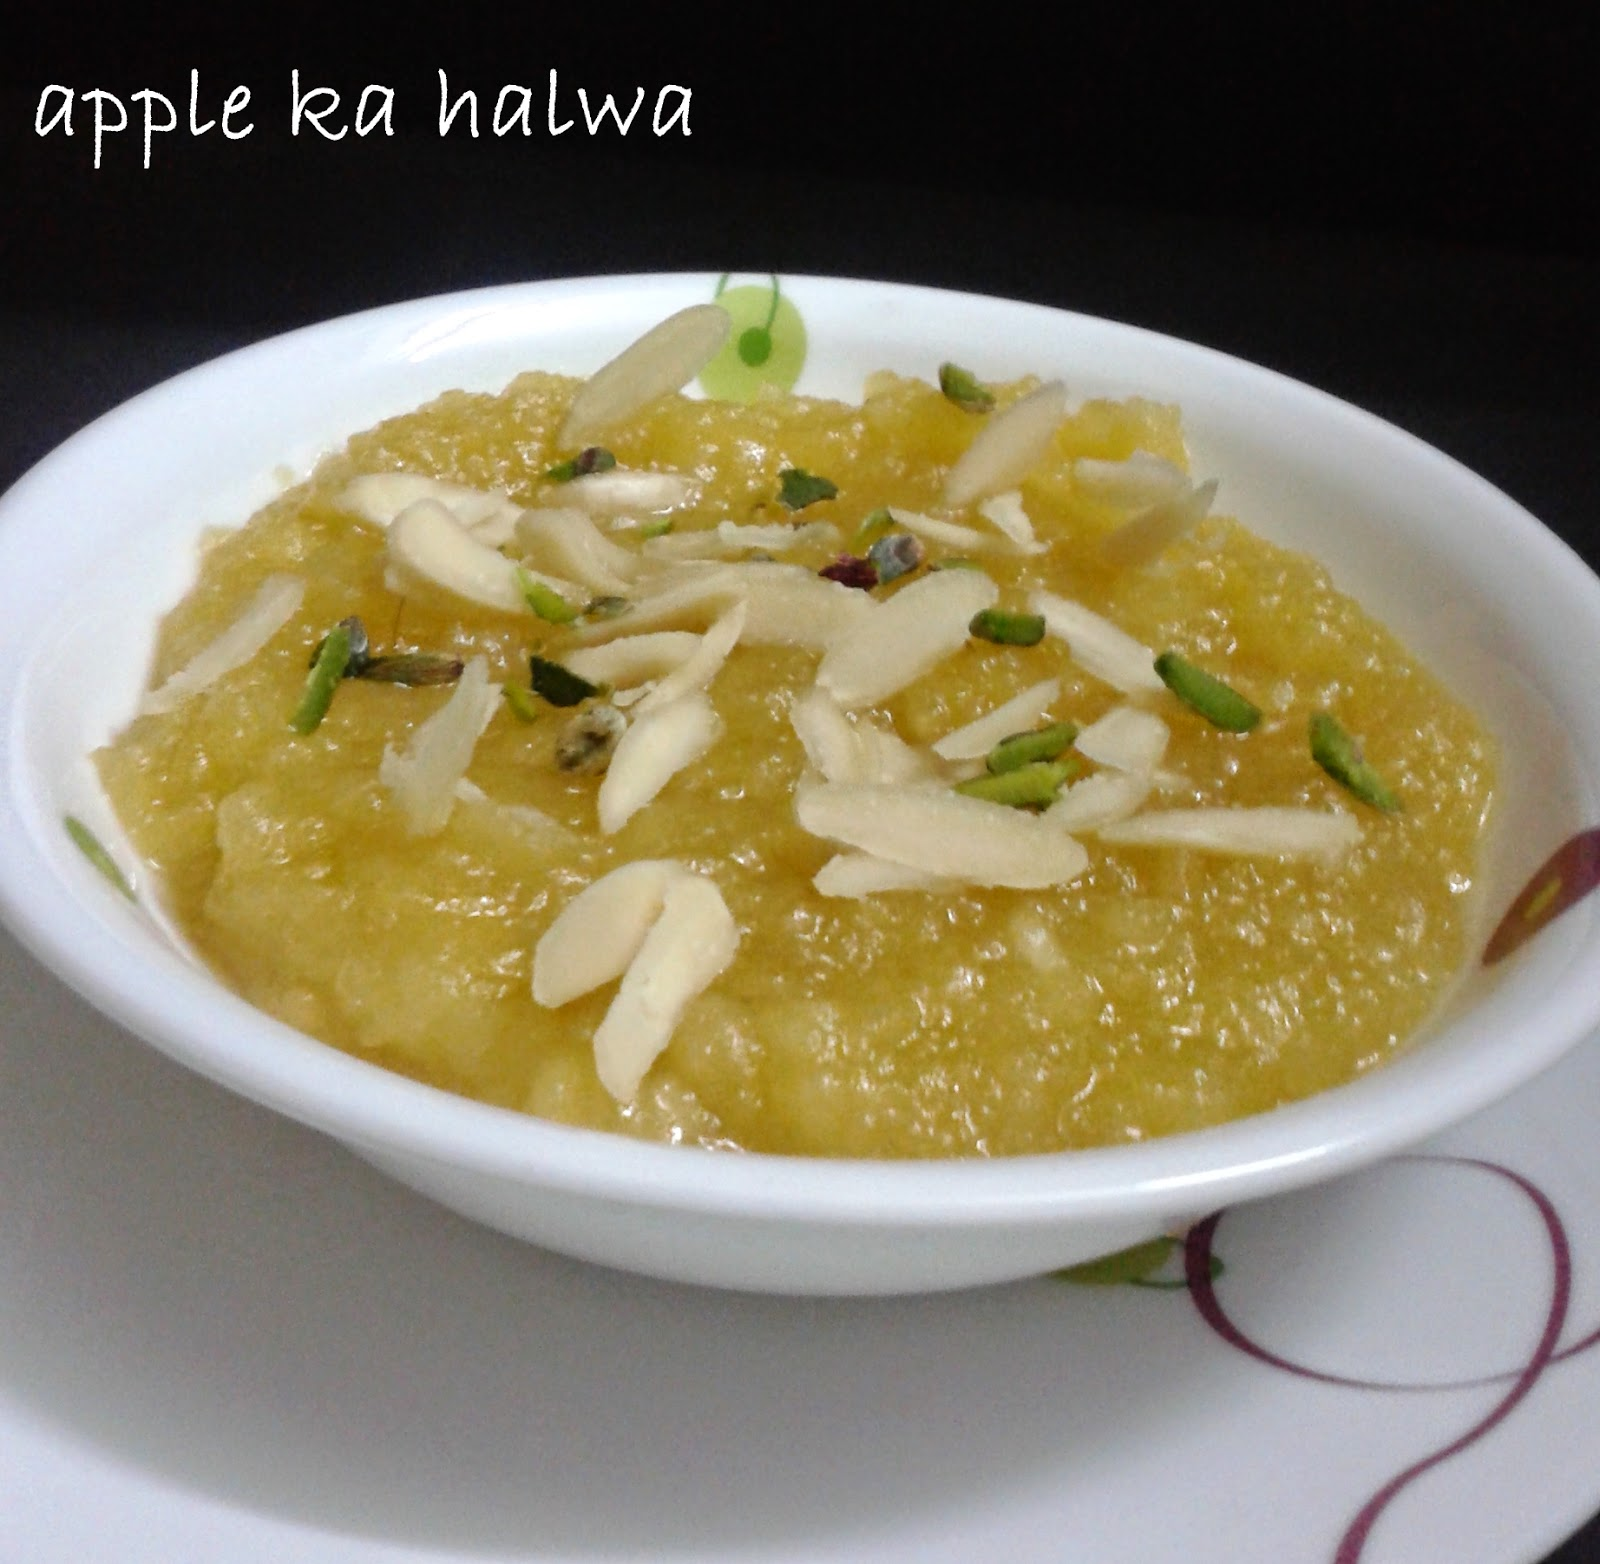 http://www.paakvidhi.com/2015/05/apple-halwa-apple-sheera.html